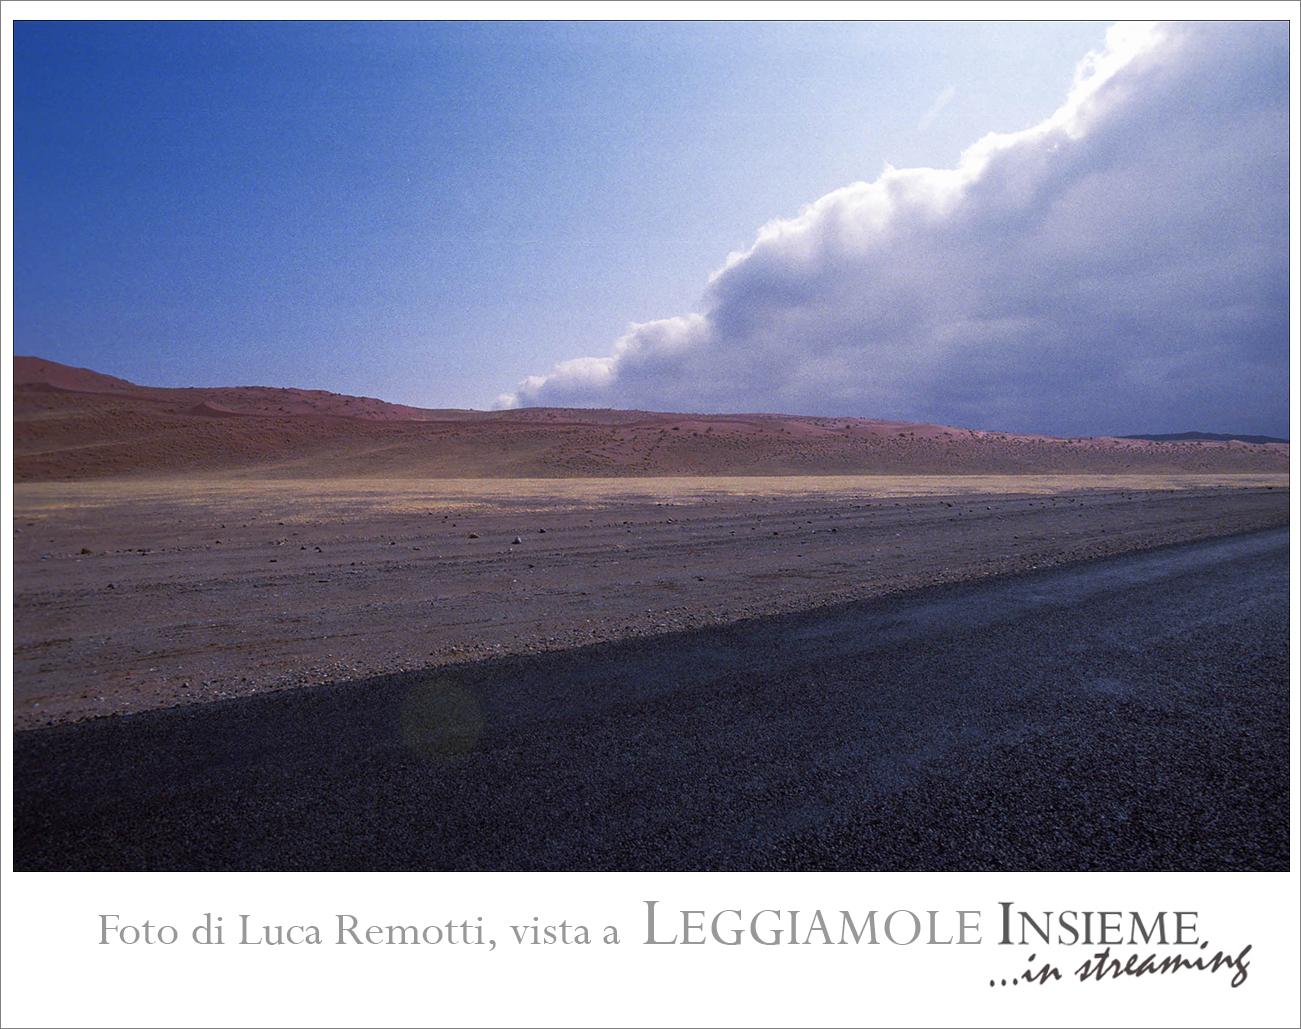 Luca_Remotti